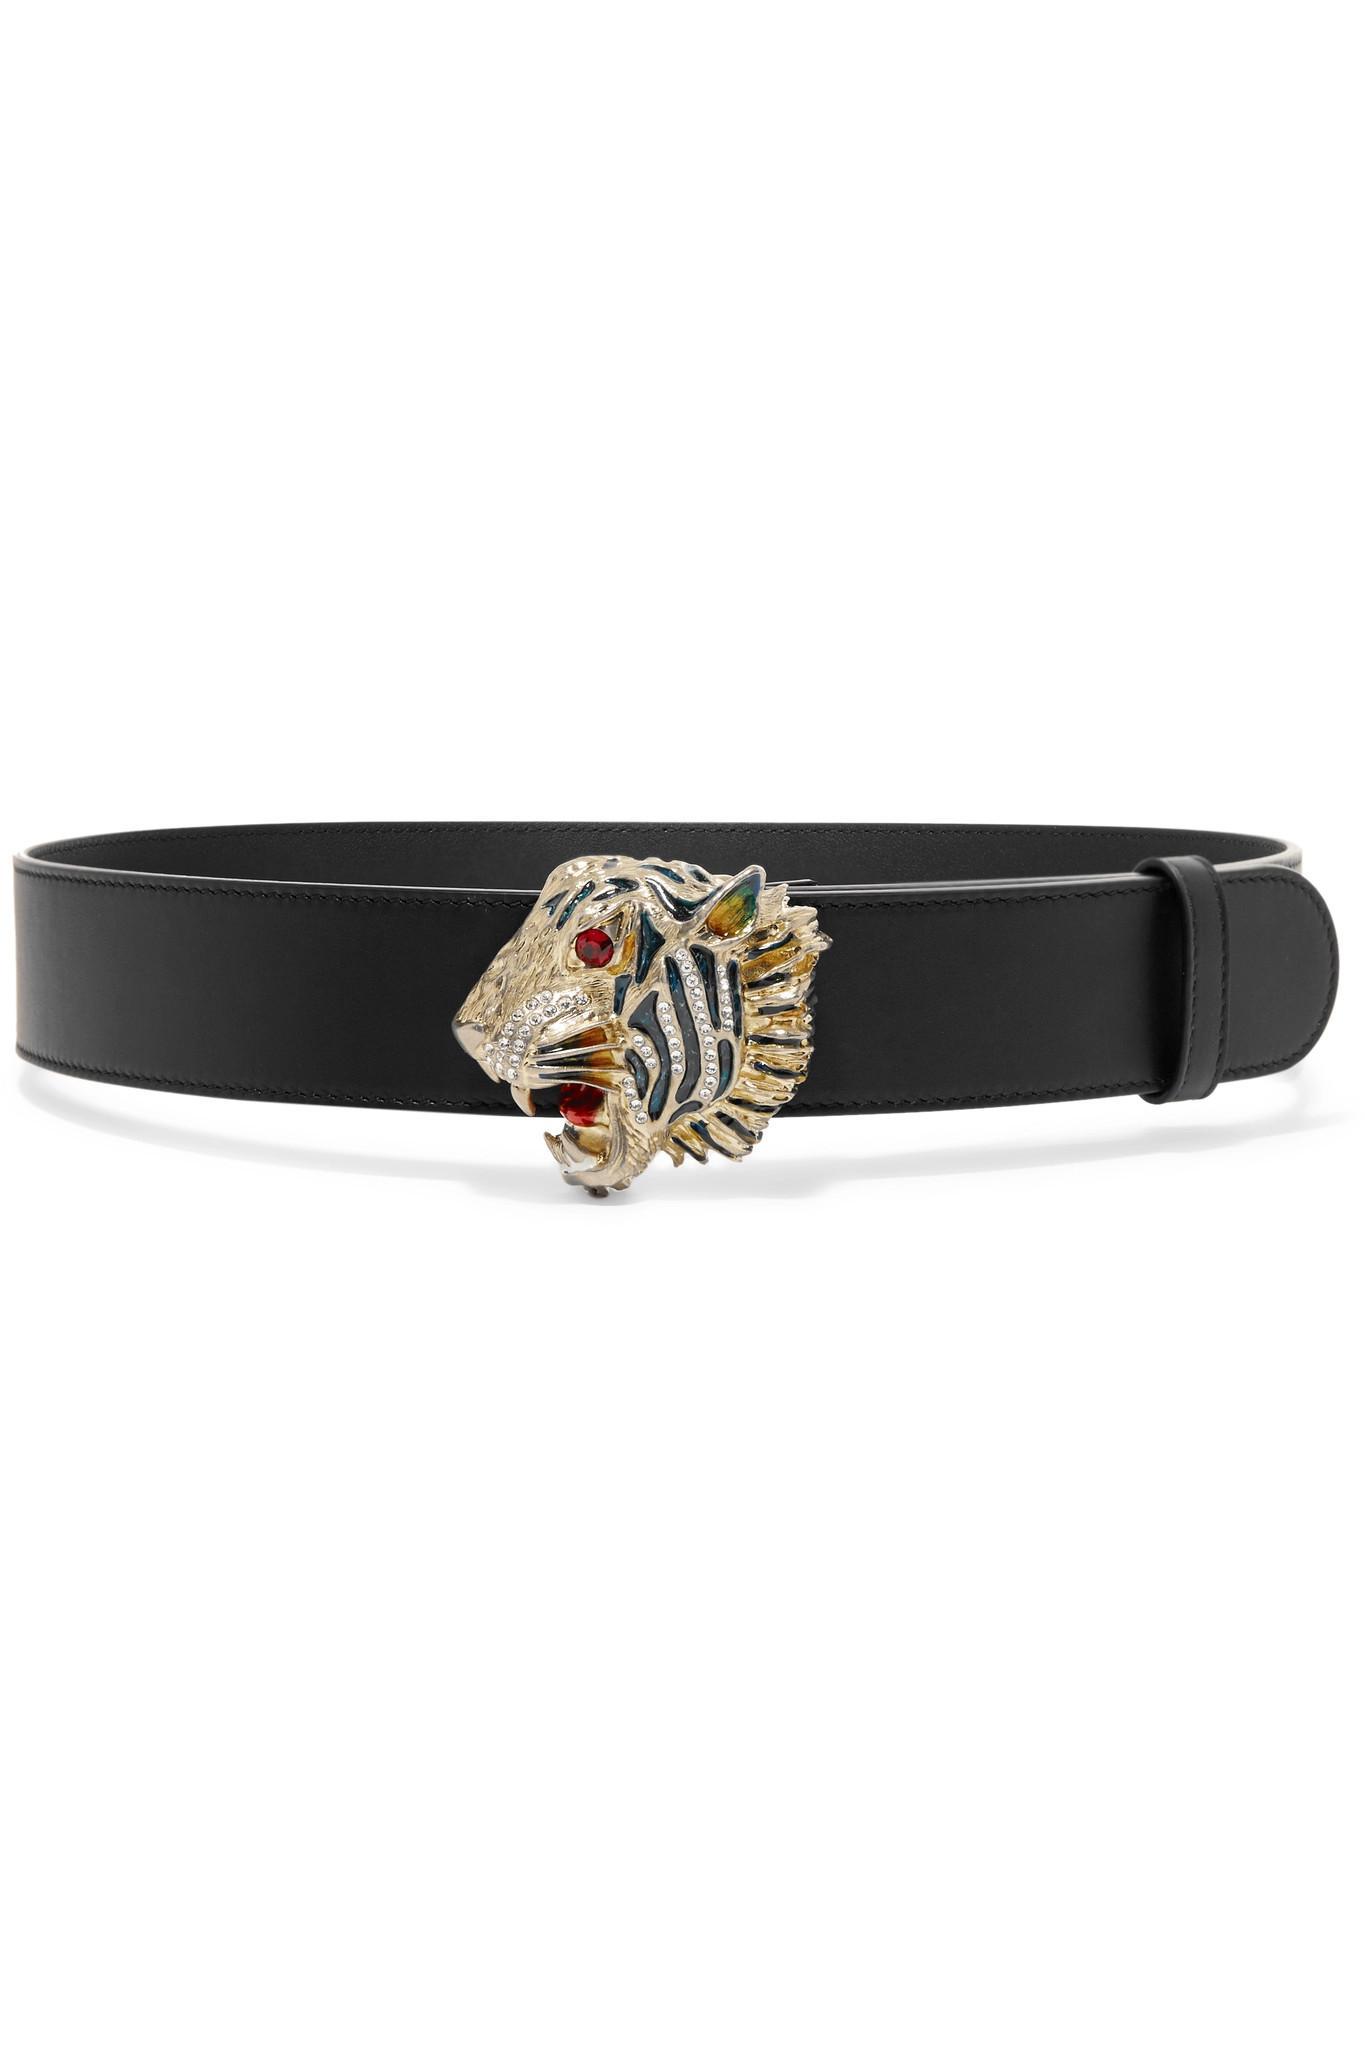 76bf11976096 Gucci Crystal-embellished Leather Belt in Black - Lyst